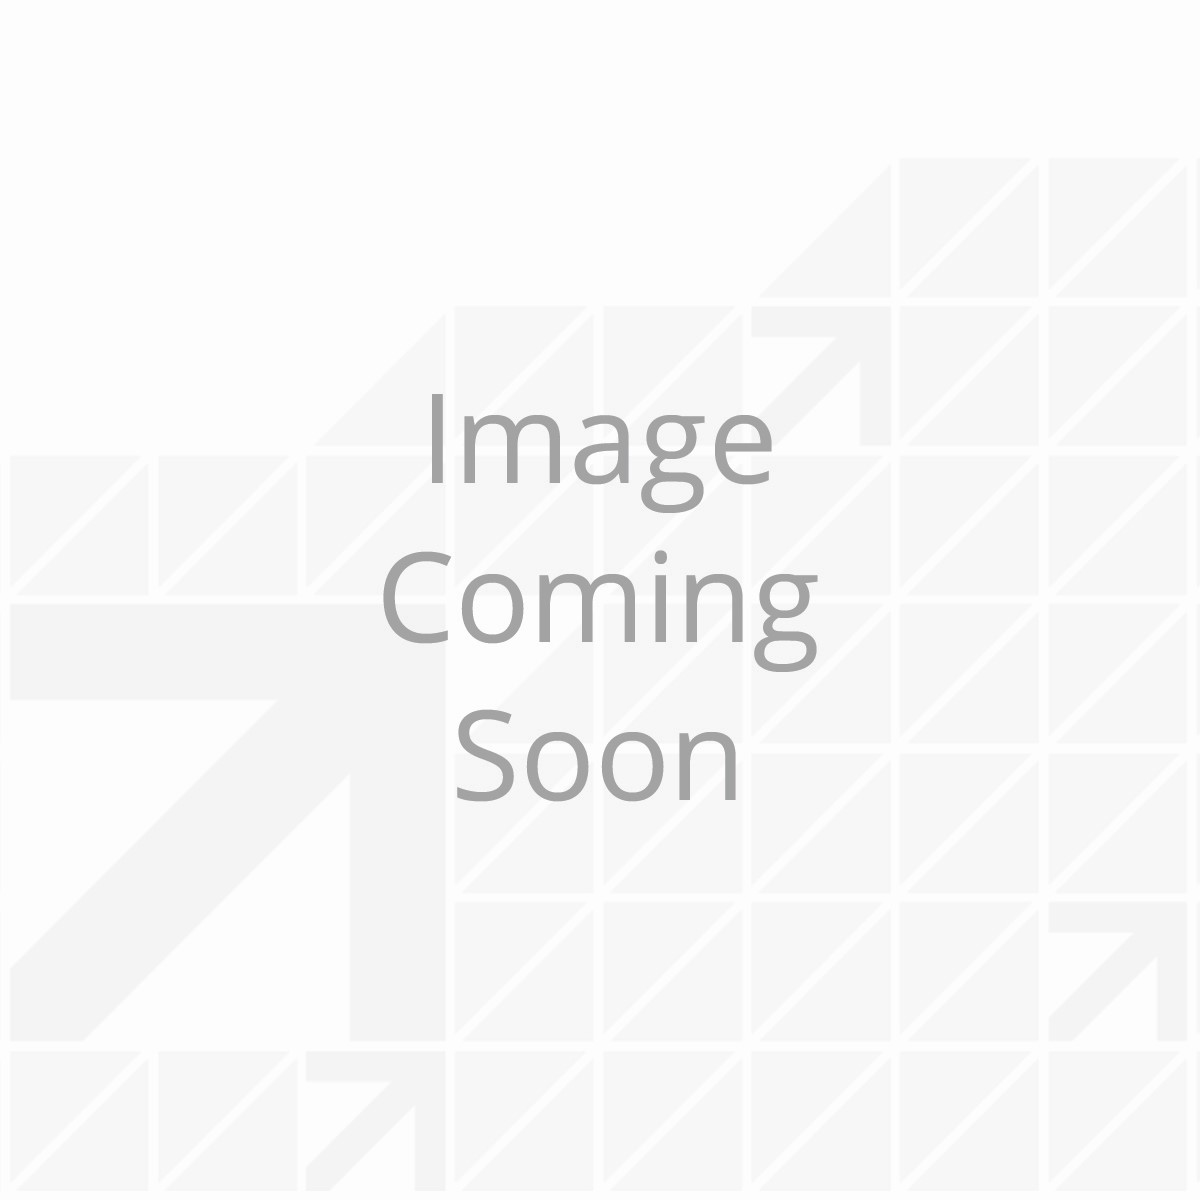 126172_-_hd_shackle_link_-_001